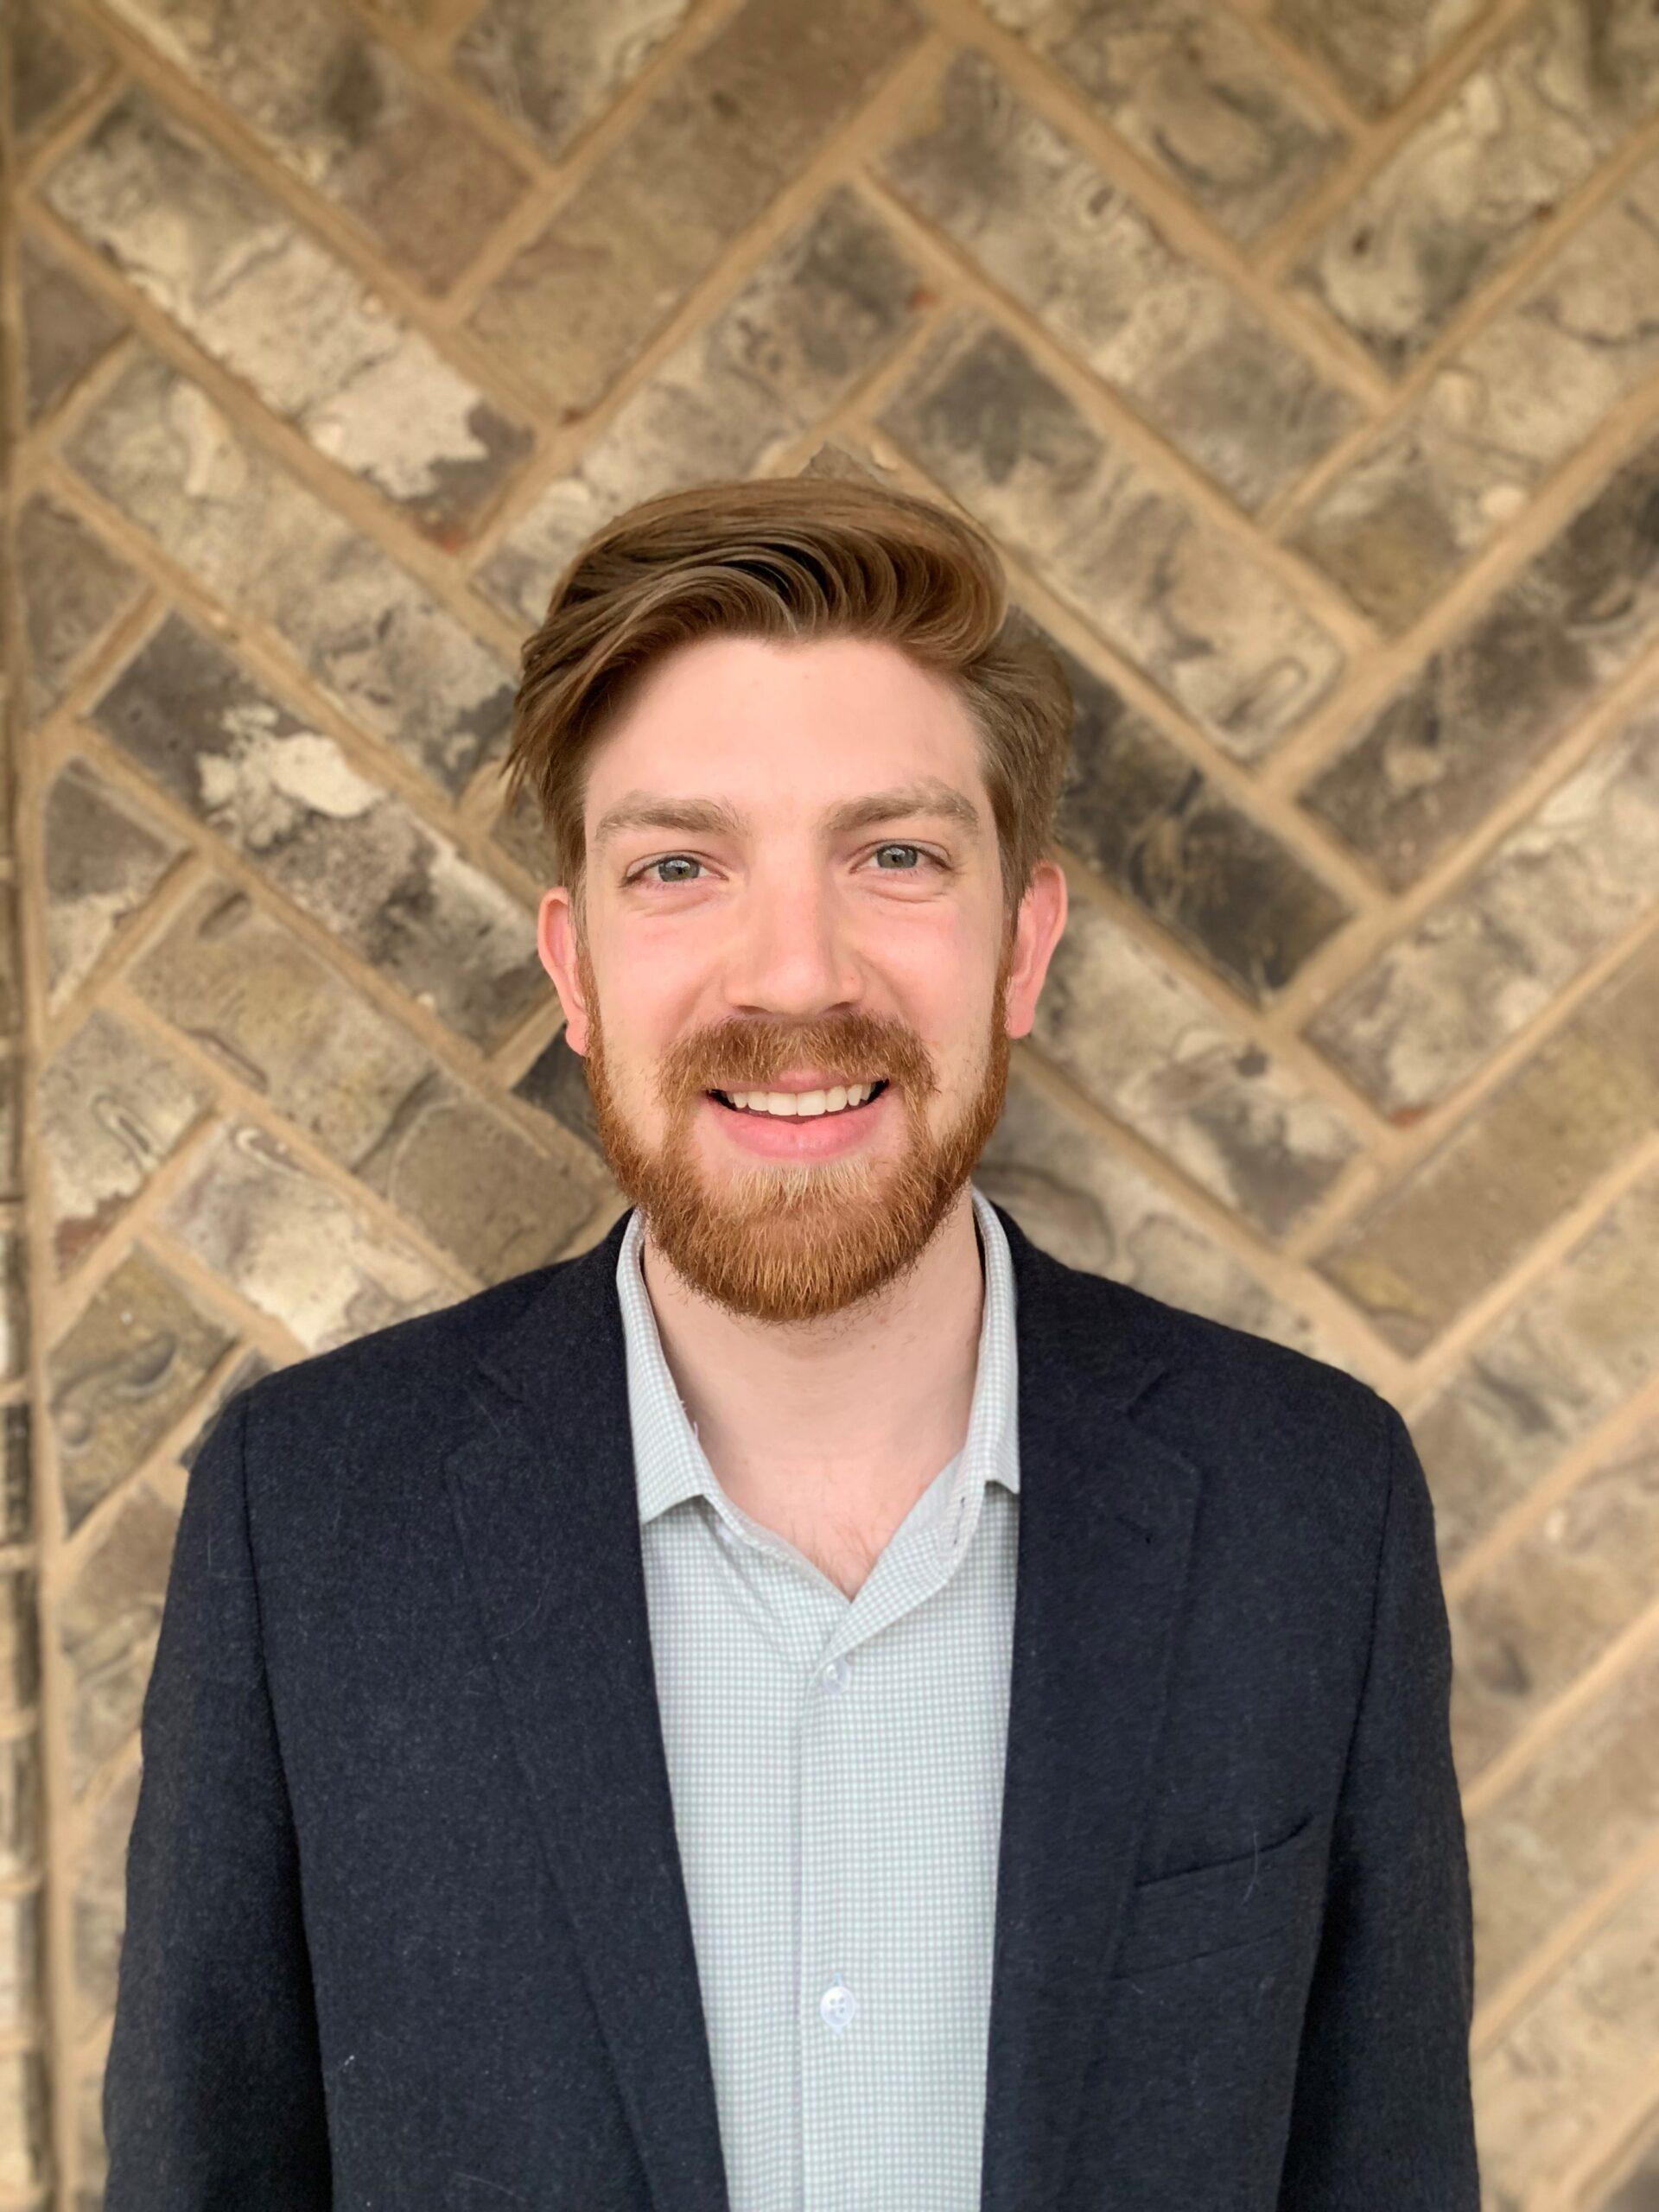 David Winston of Texas Next Capital is a member of XPX Austin